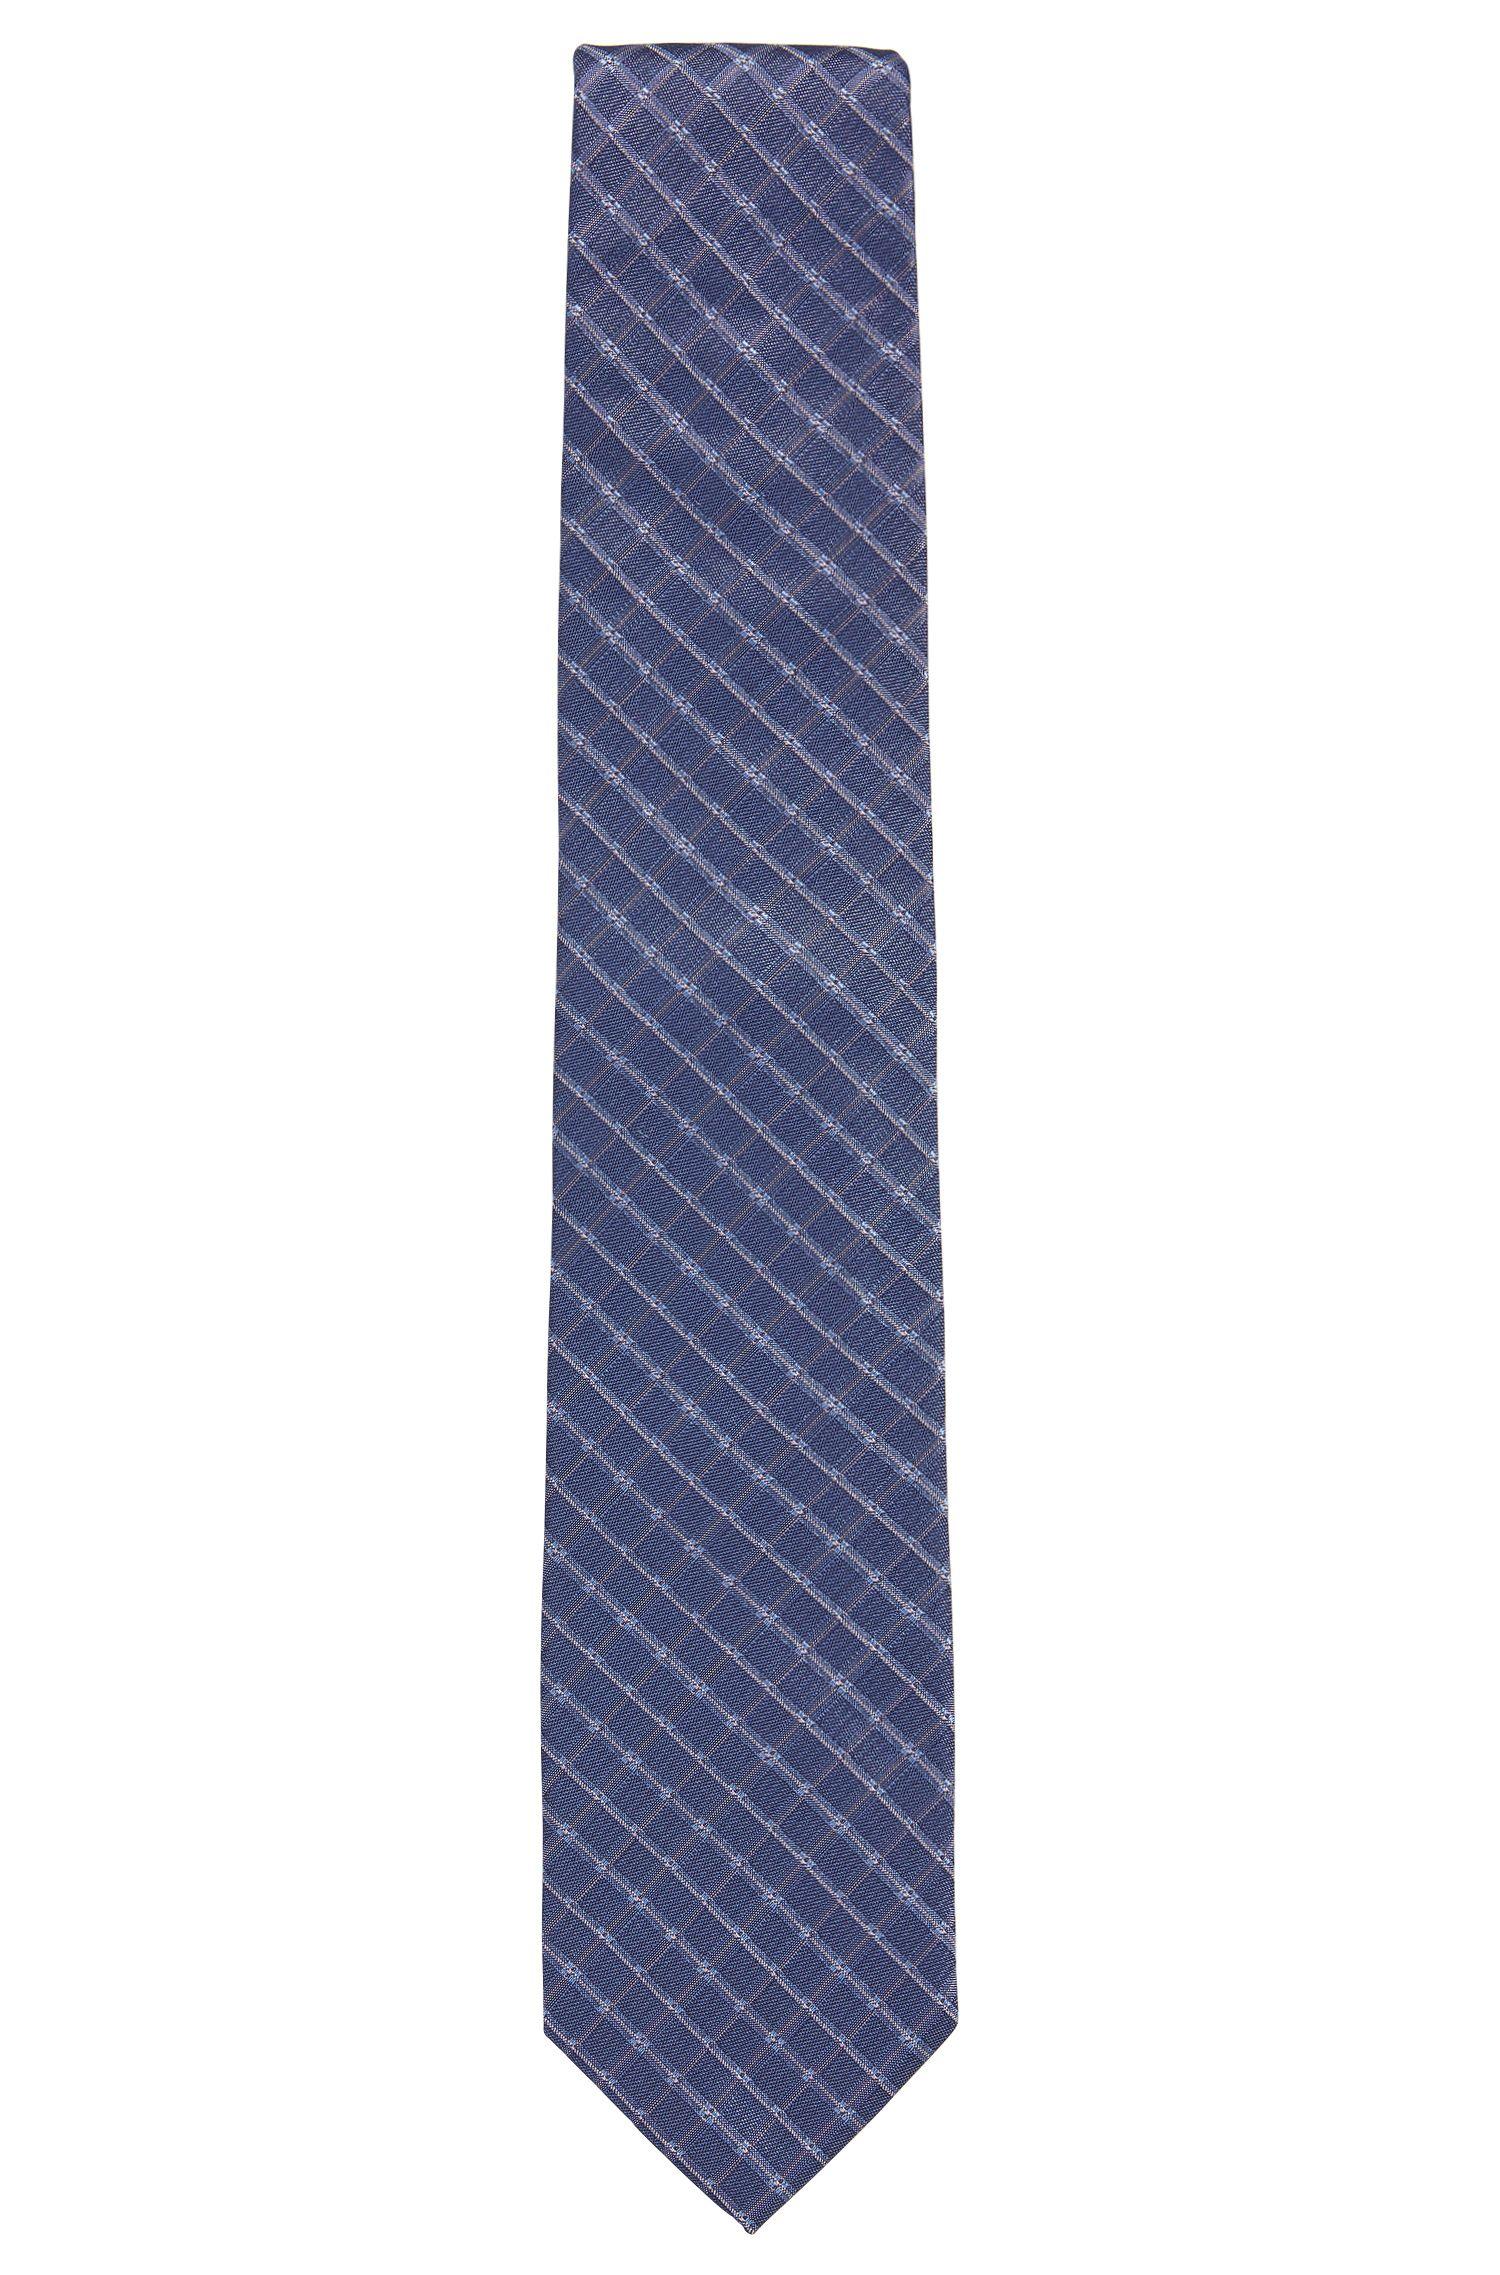 Checked Italian Silk Tie, Dark Blue